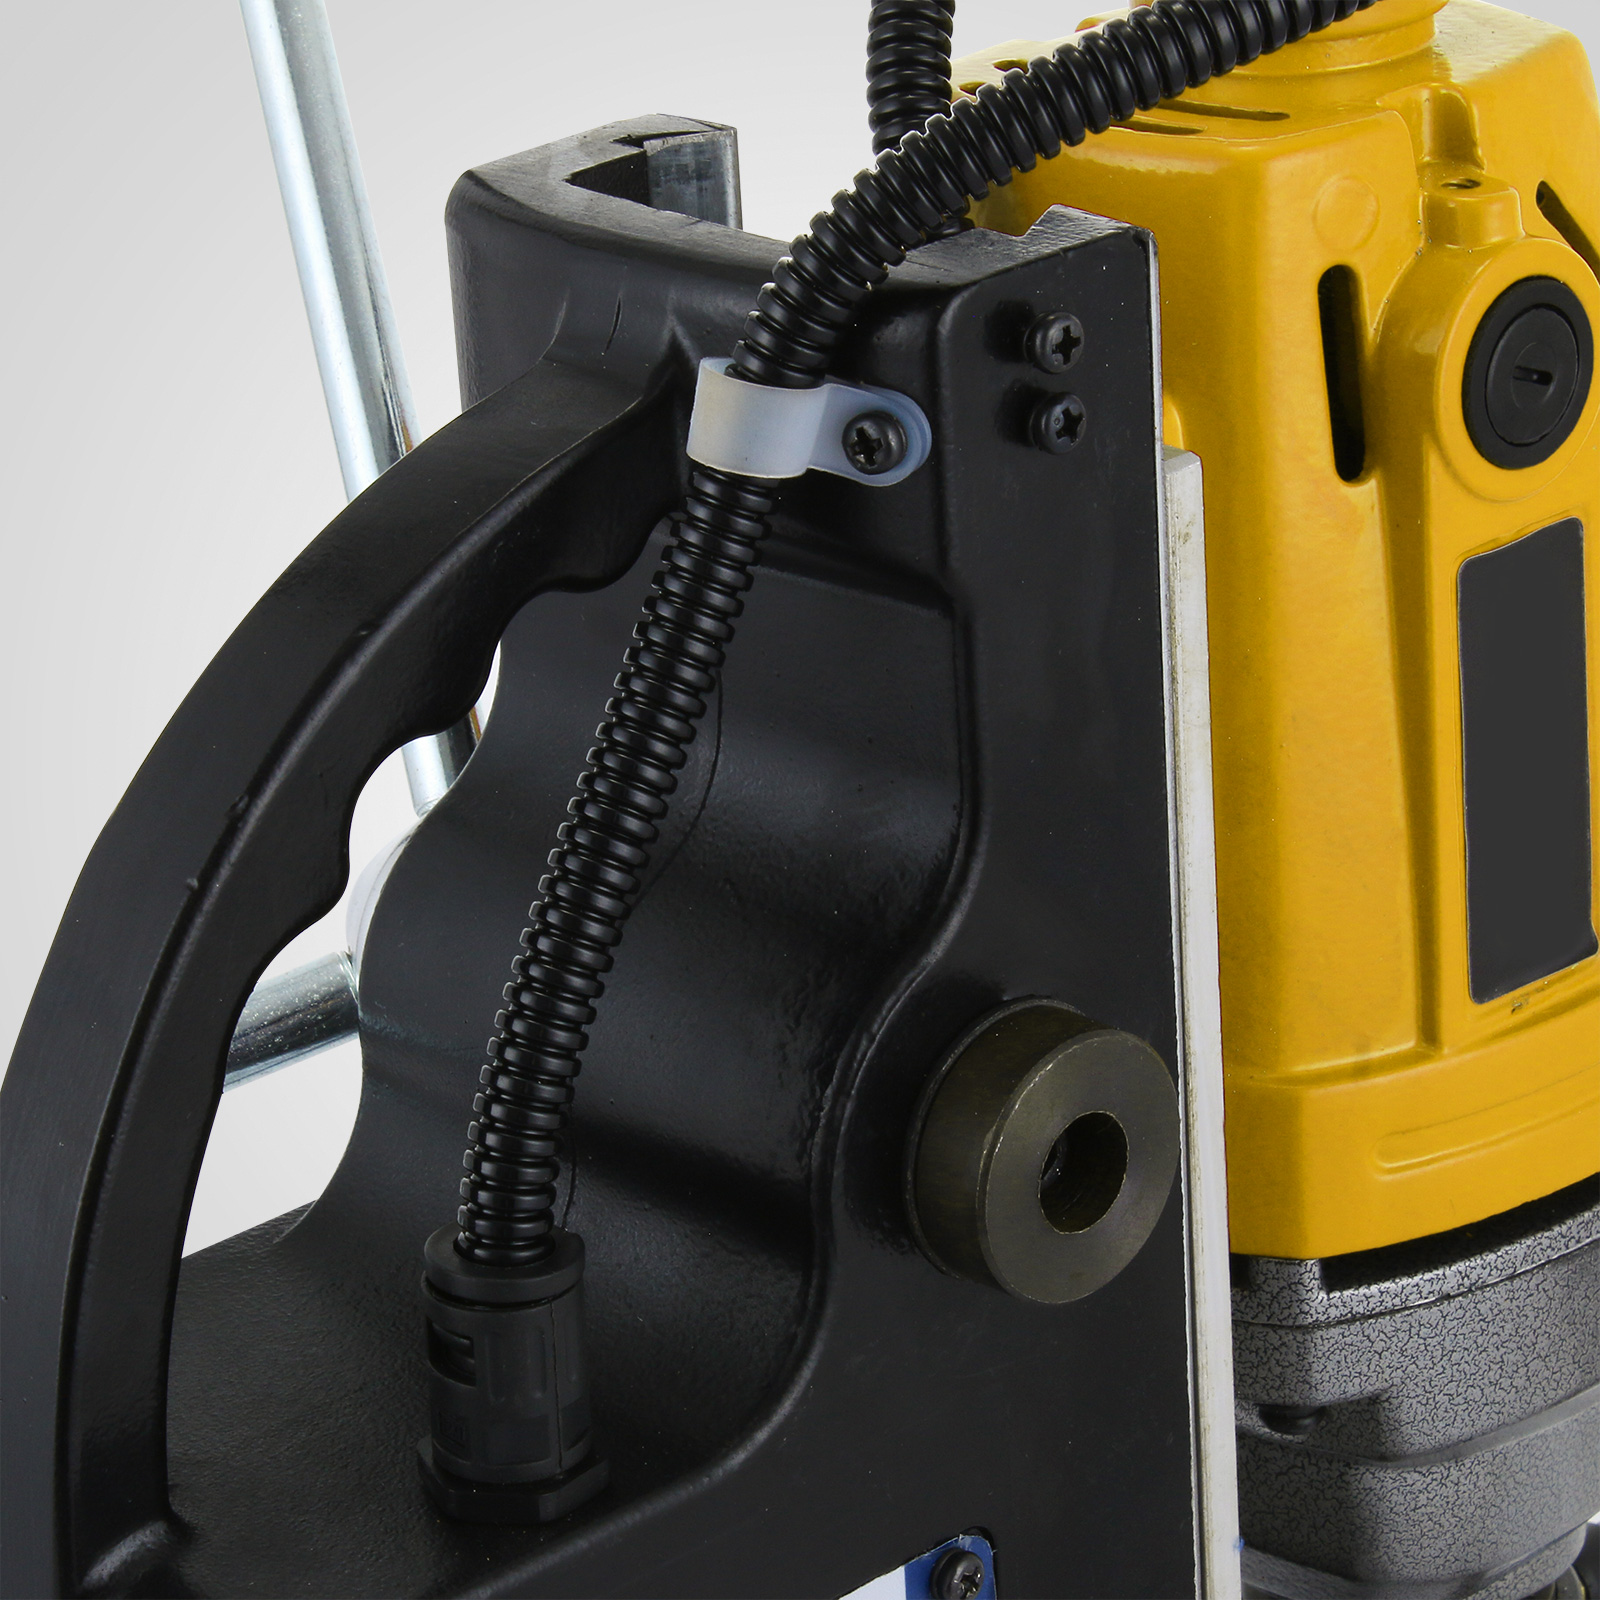 MB23-BRM35-MD40-Trapano-Perforatrice-Carotatore-Fresa-Magnetico-12-40mm-230V miniatura 46